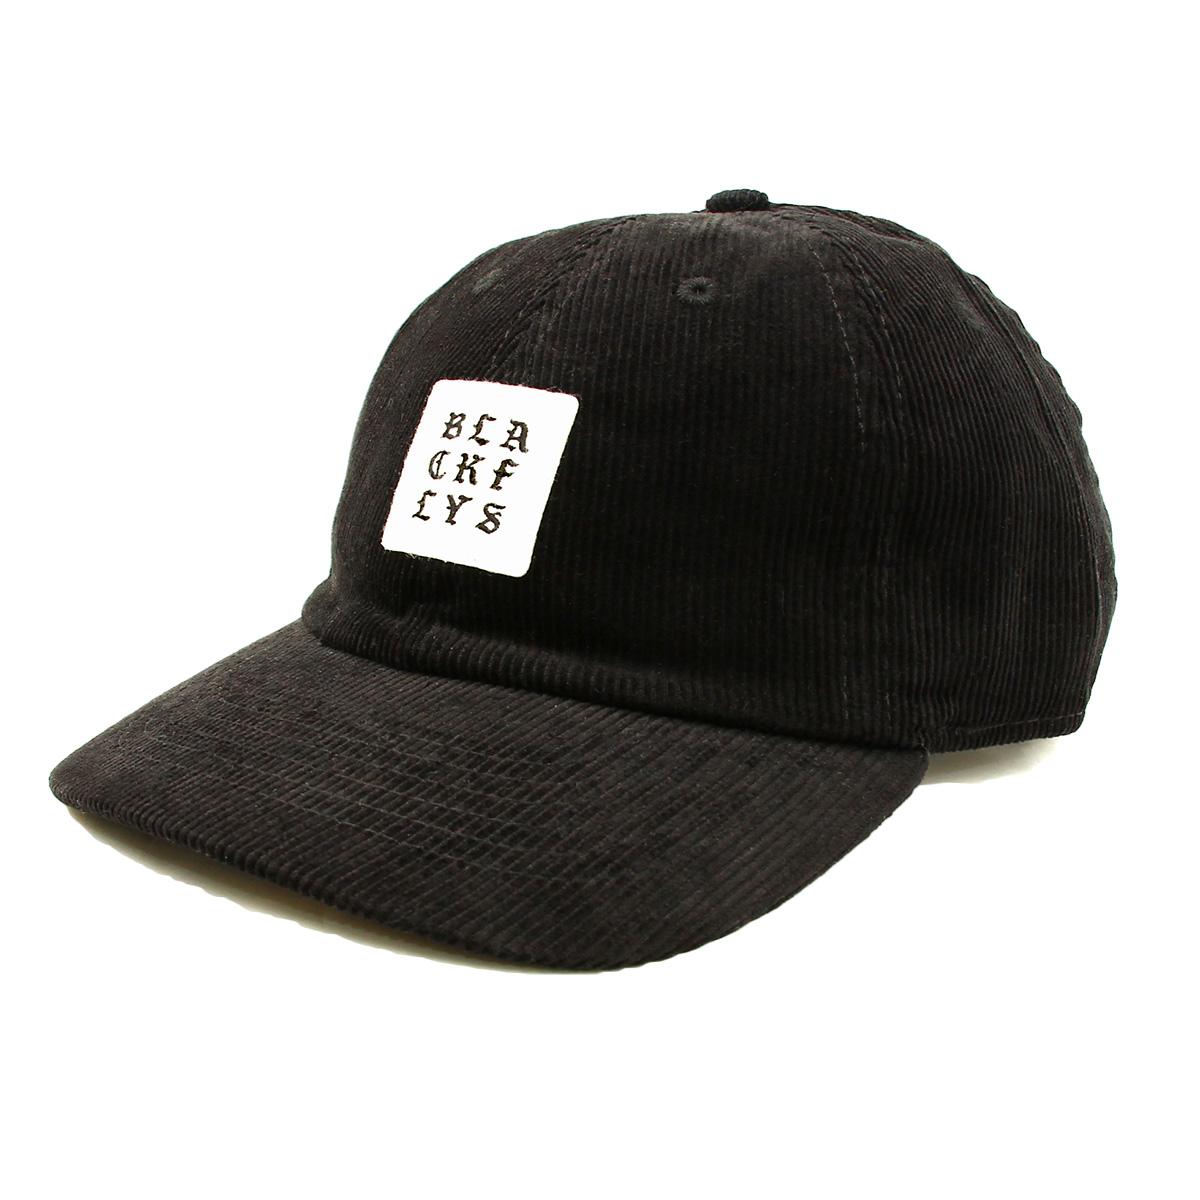 DICE CORDUROY CAP